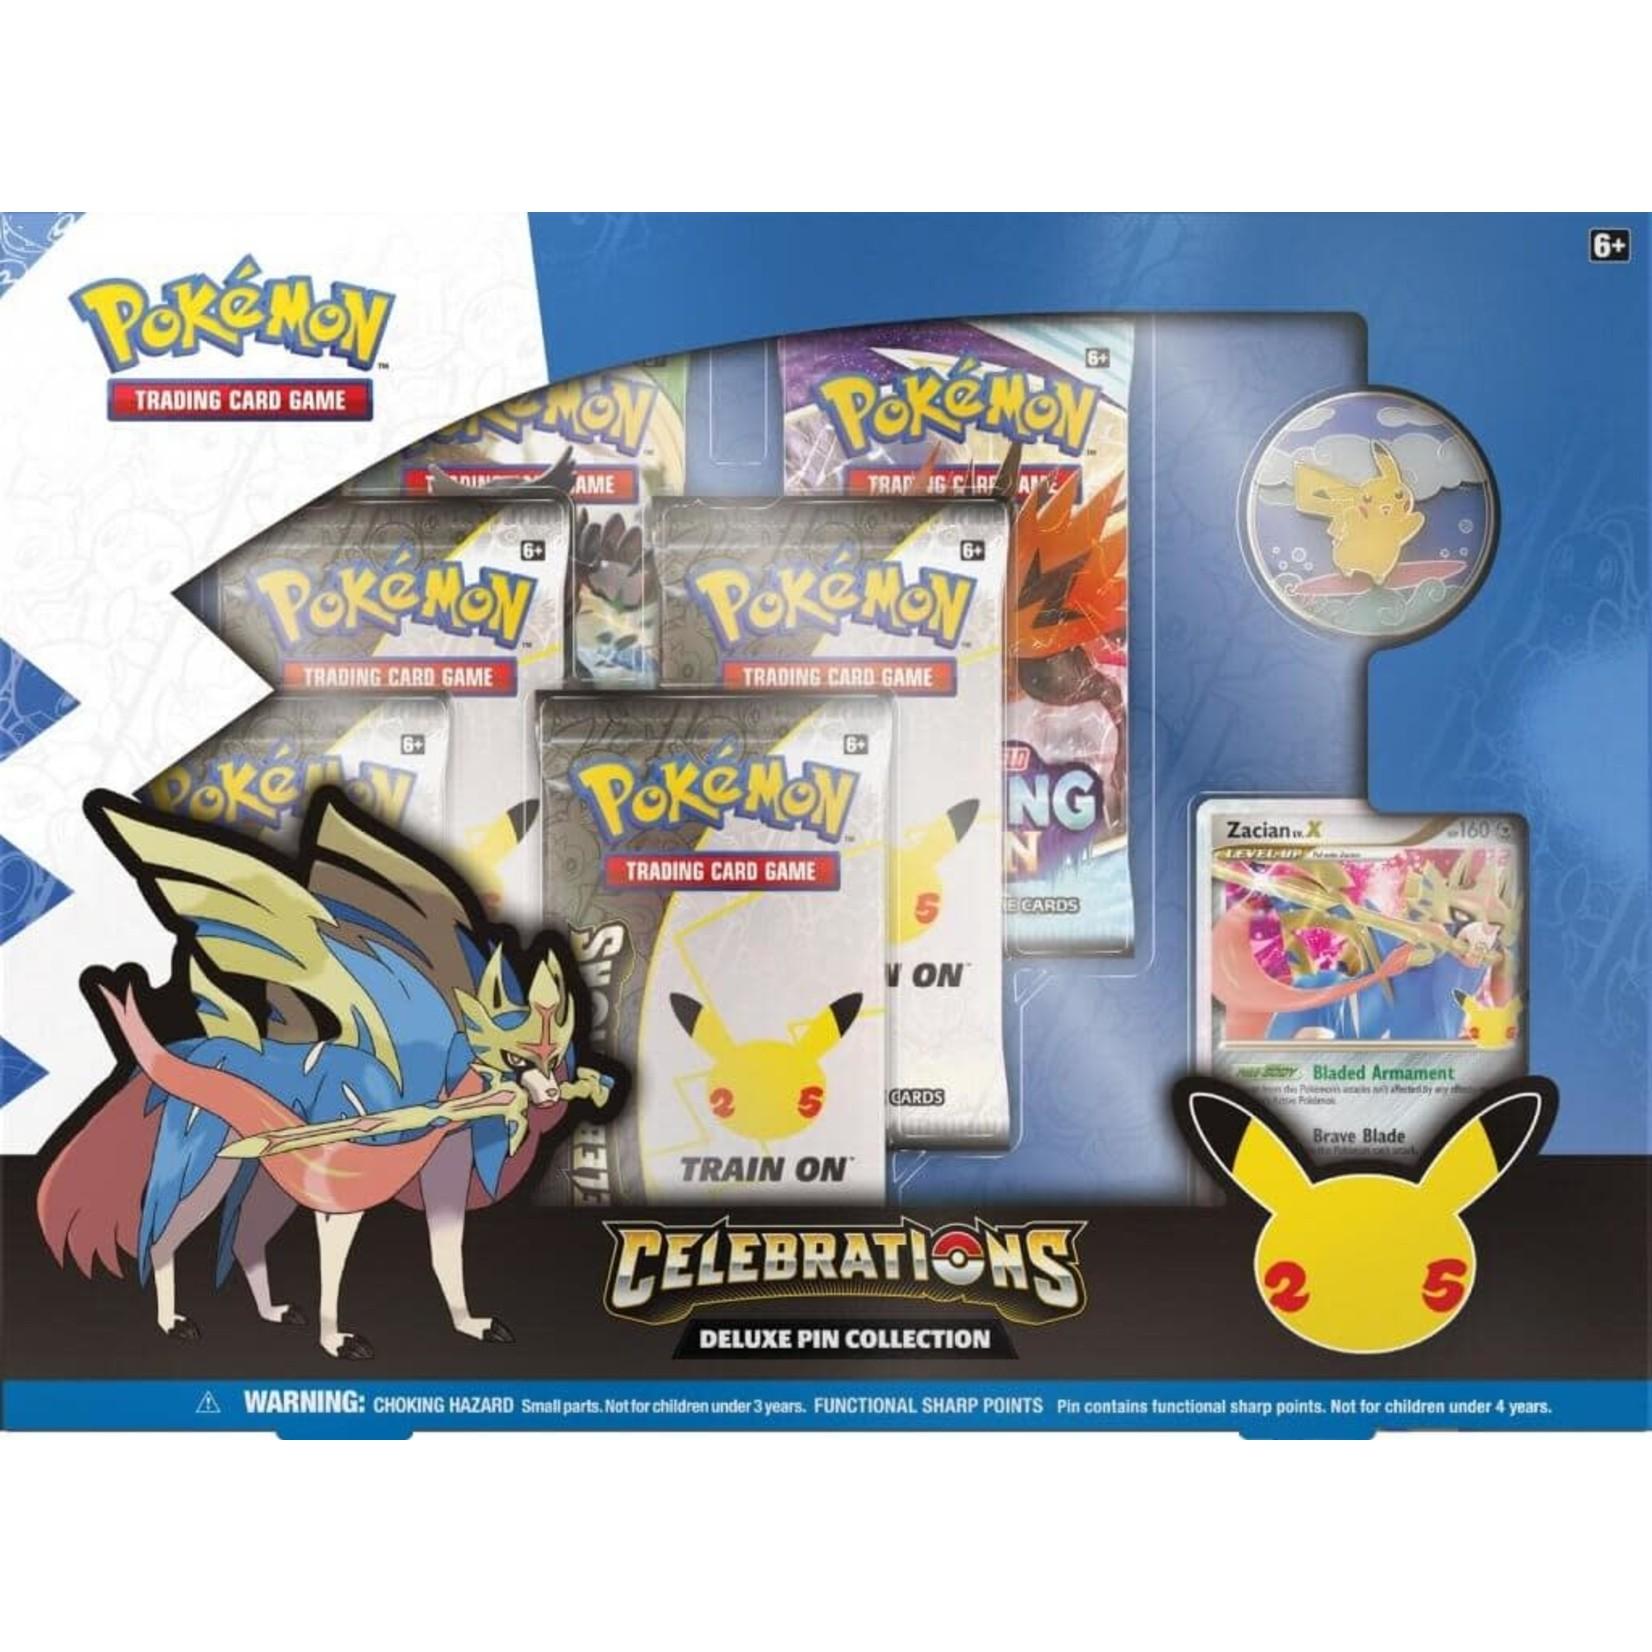 The Pokemon Company [Preorder] POKEMON CELEBRATIONS DELUXE PIN COLLECTION